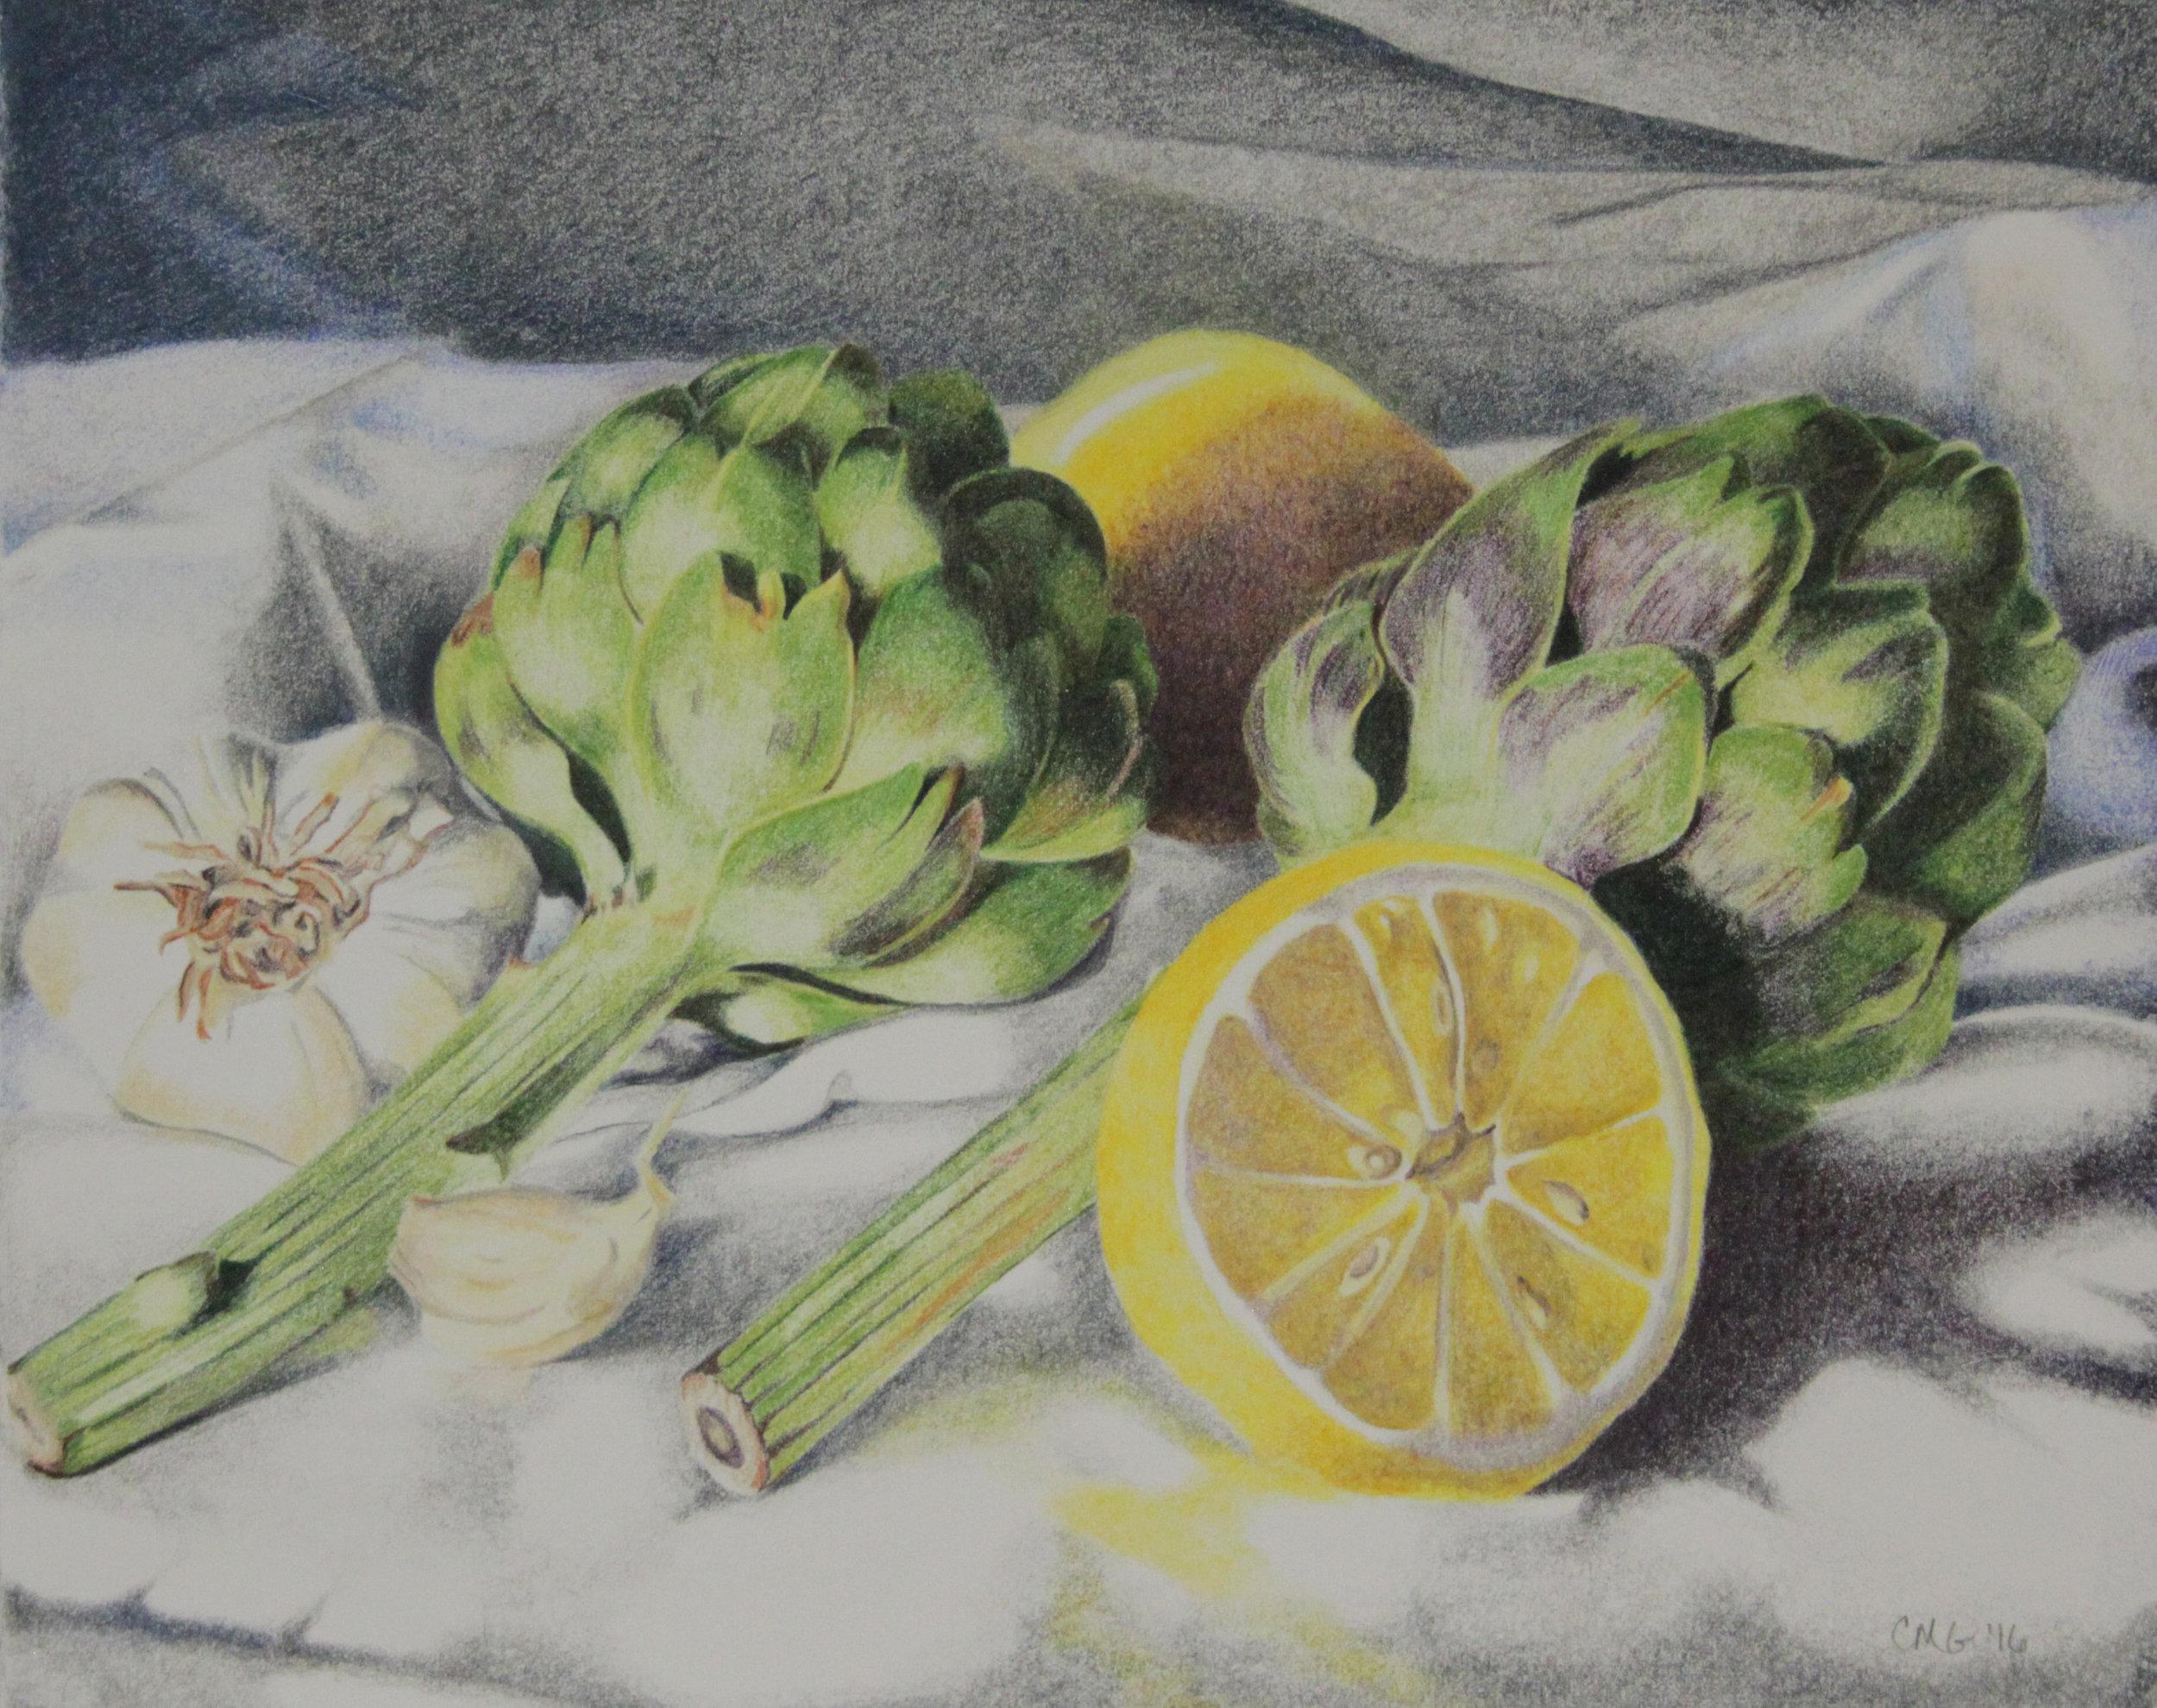 Artichokes & Lemons Still Life